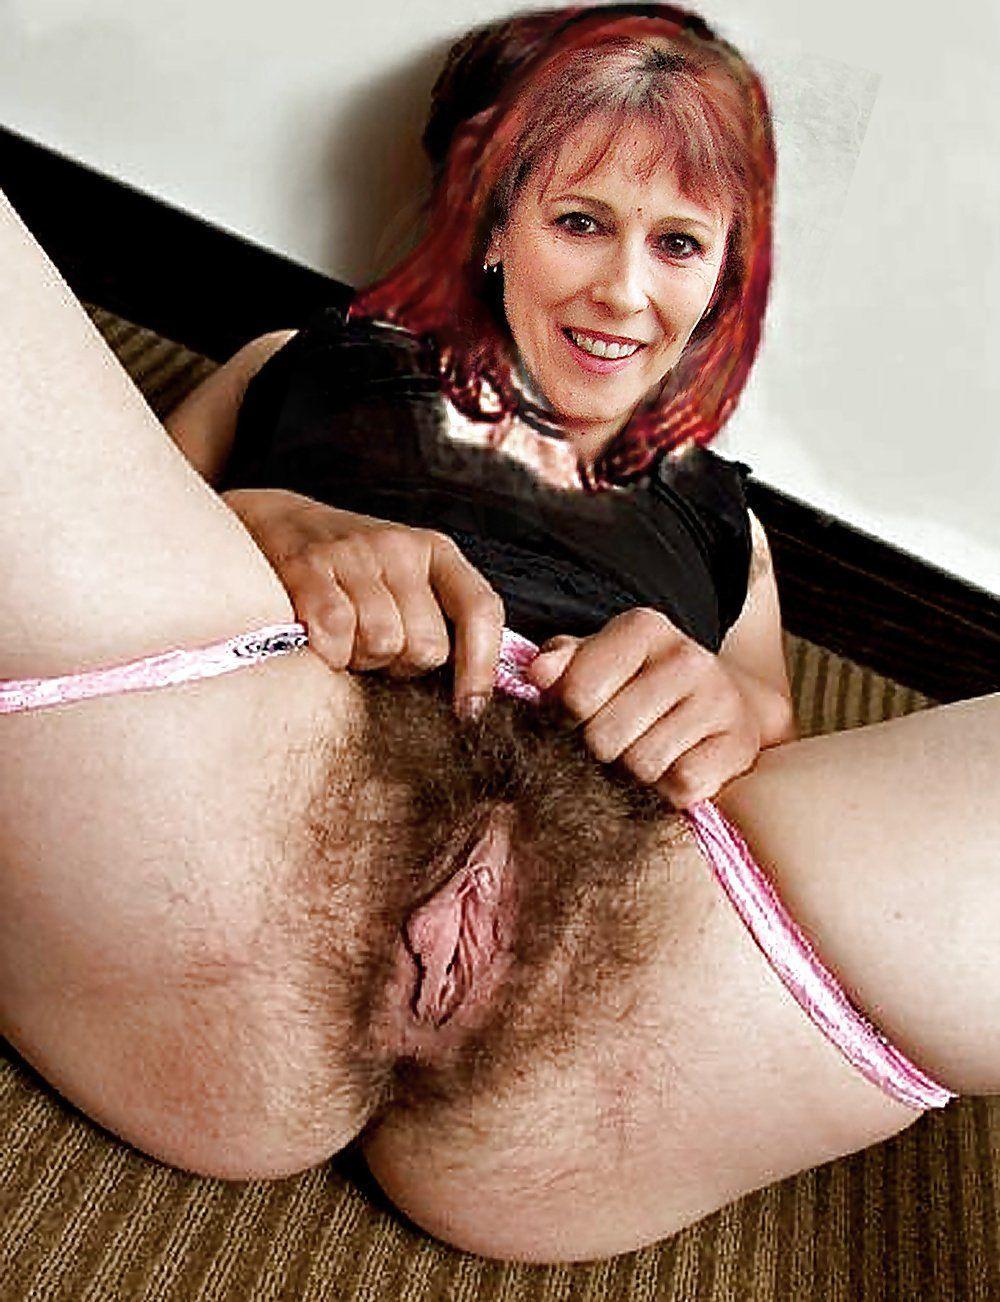 Brianna com first her lesbian sex